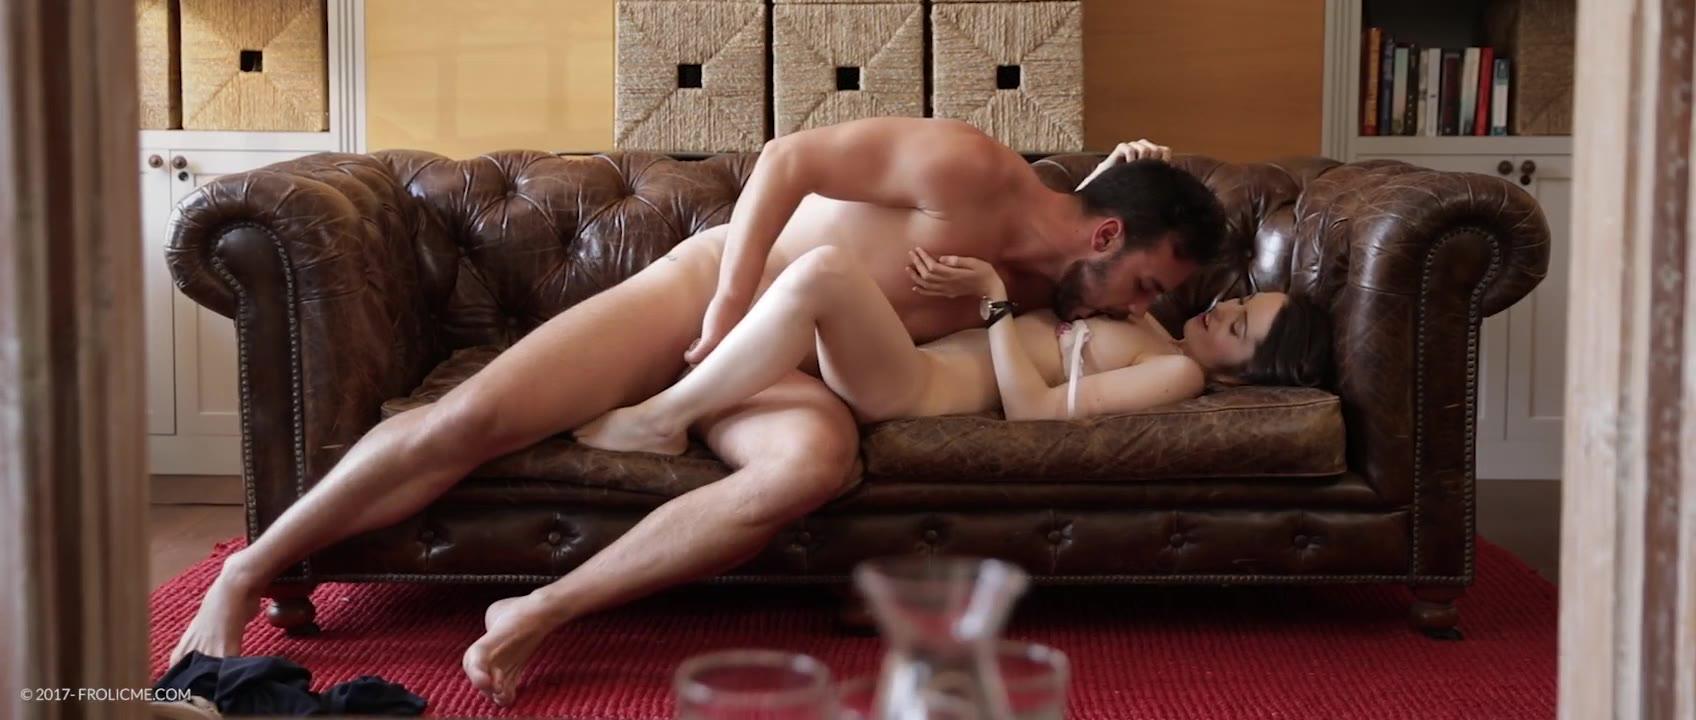 Sex in the sofa